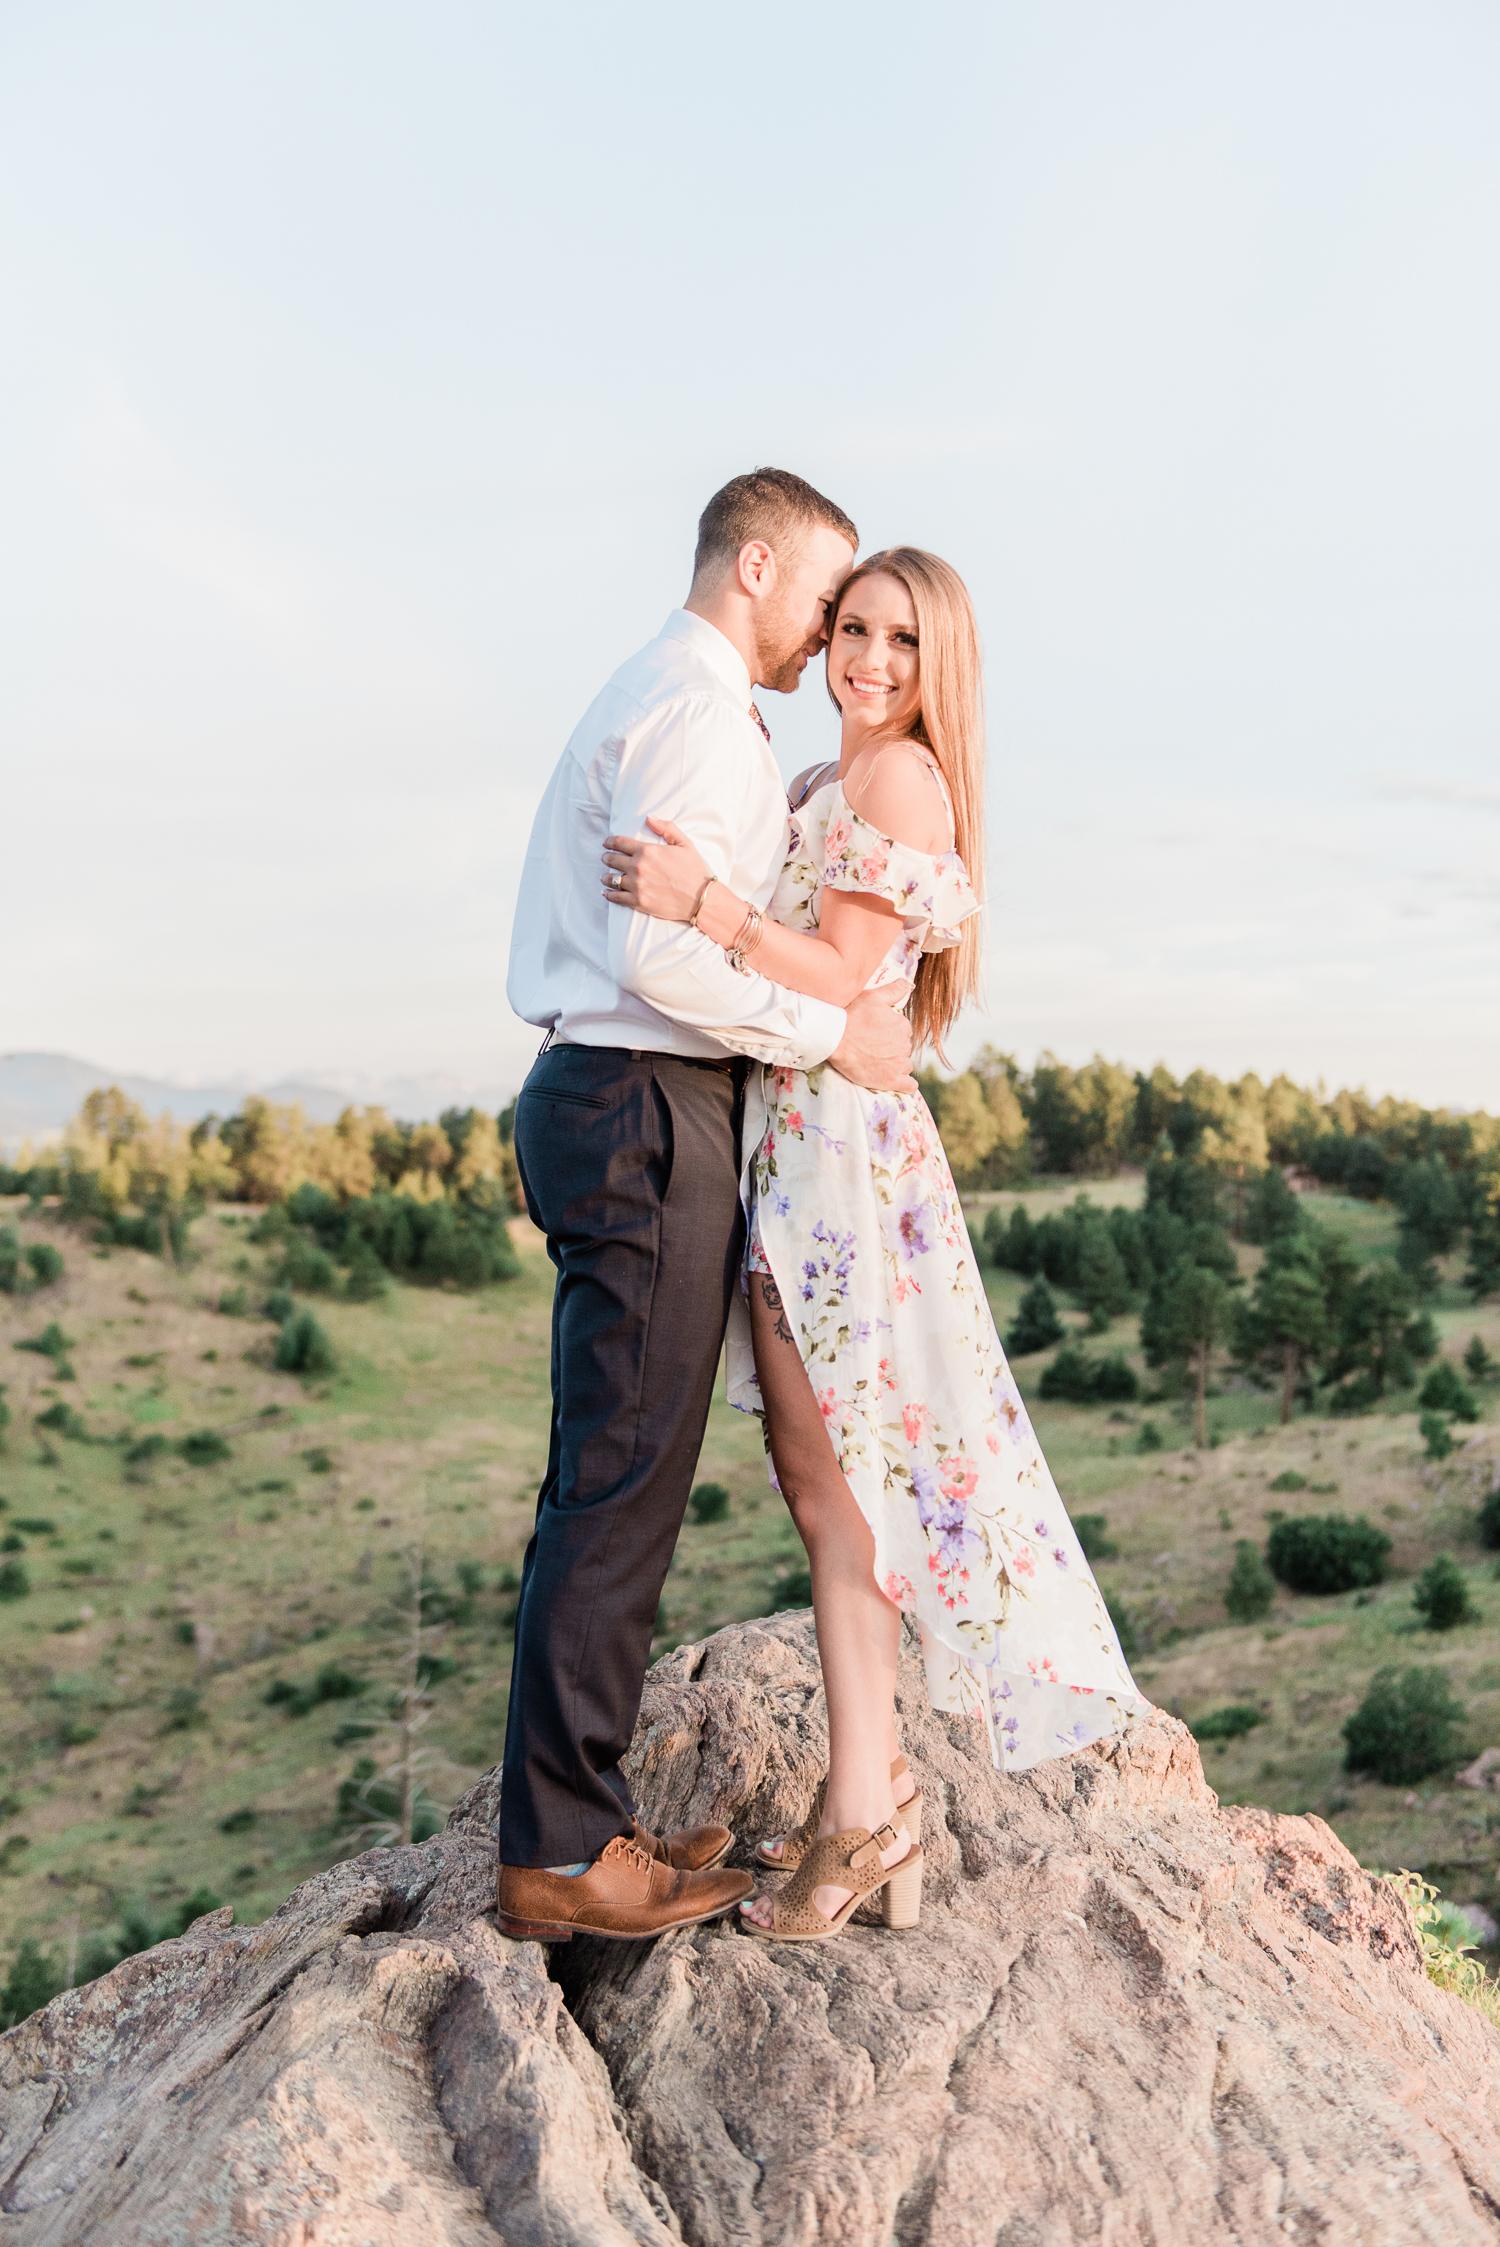 2019-08-30-Engagement-Morgan-Adam-MtFalcon-1239.jpg